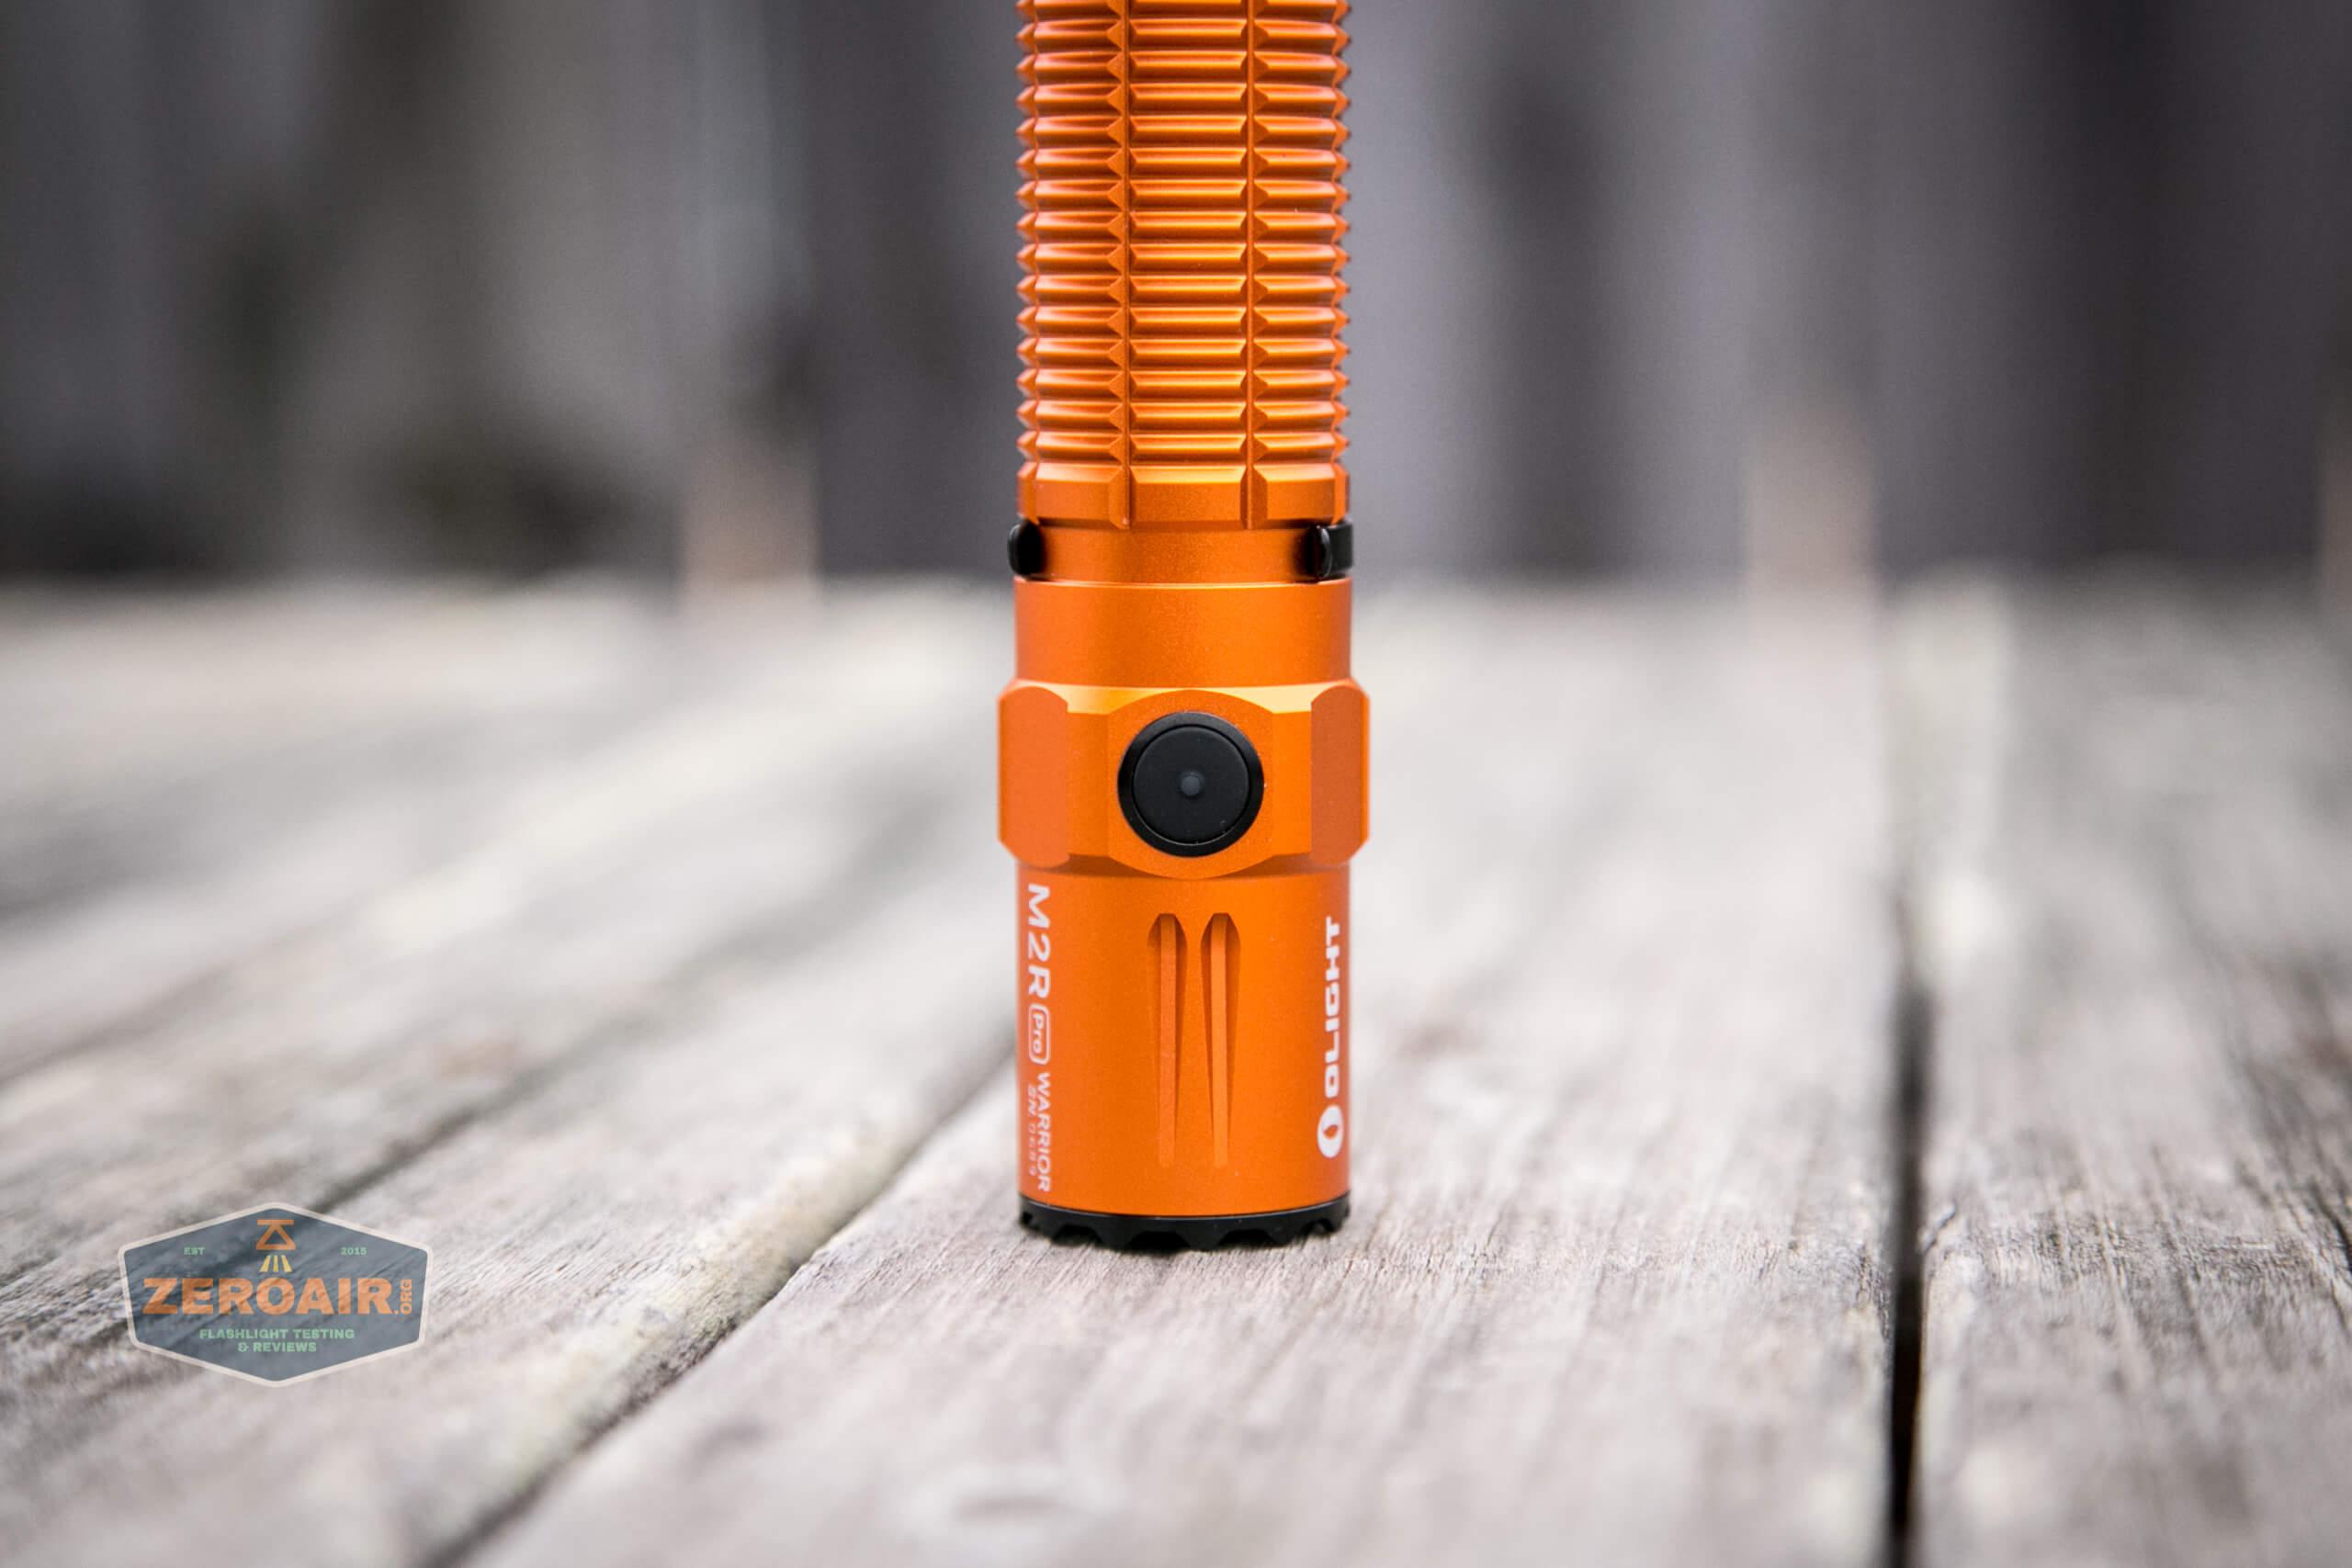 Olight M2R Pro Warrior Orange headstanding